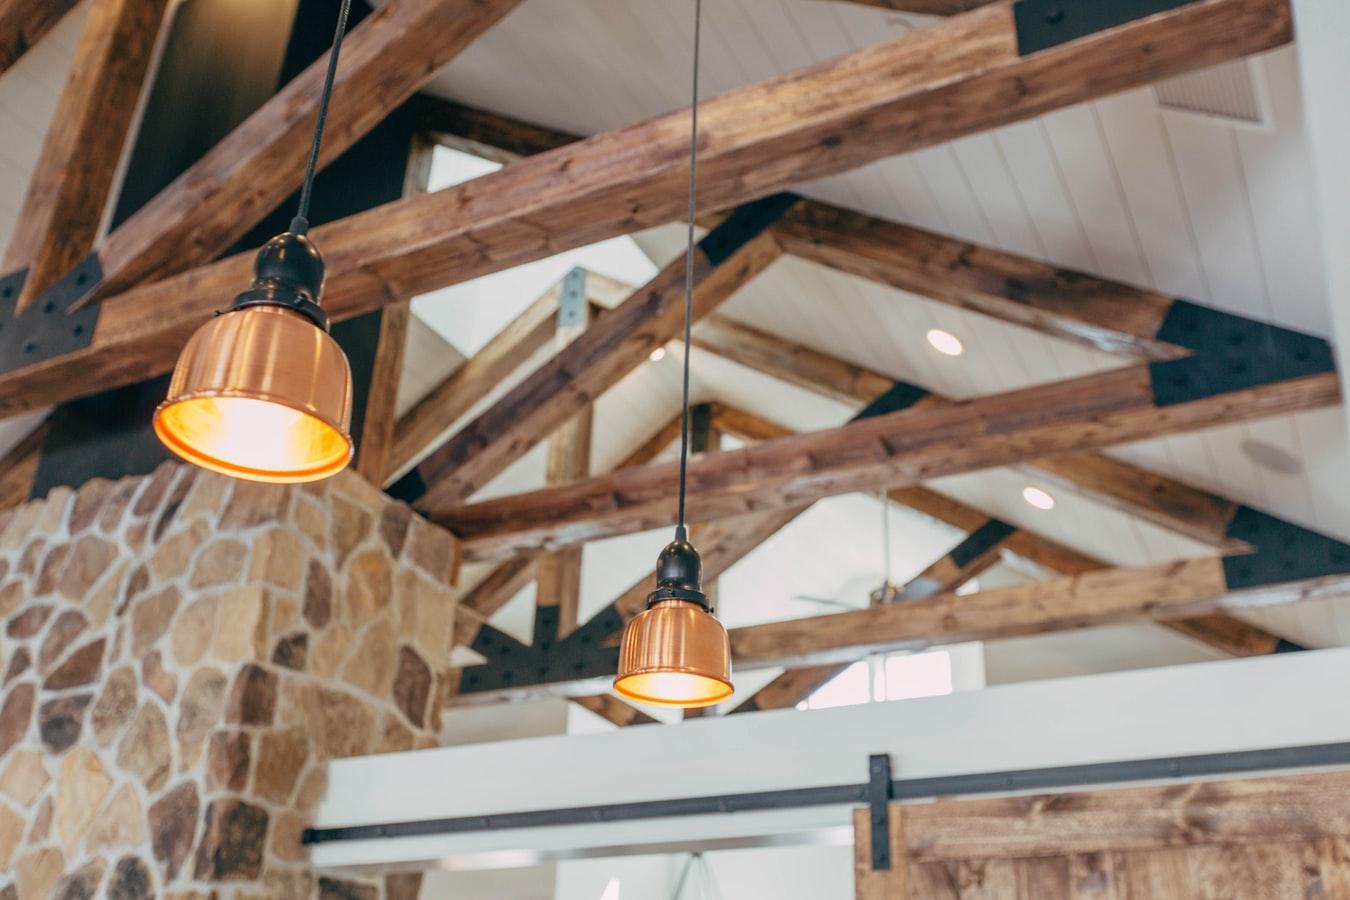 Väzníková alebo klasická strecha? Výhody a nevýhody